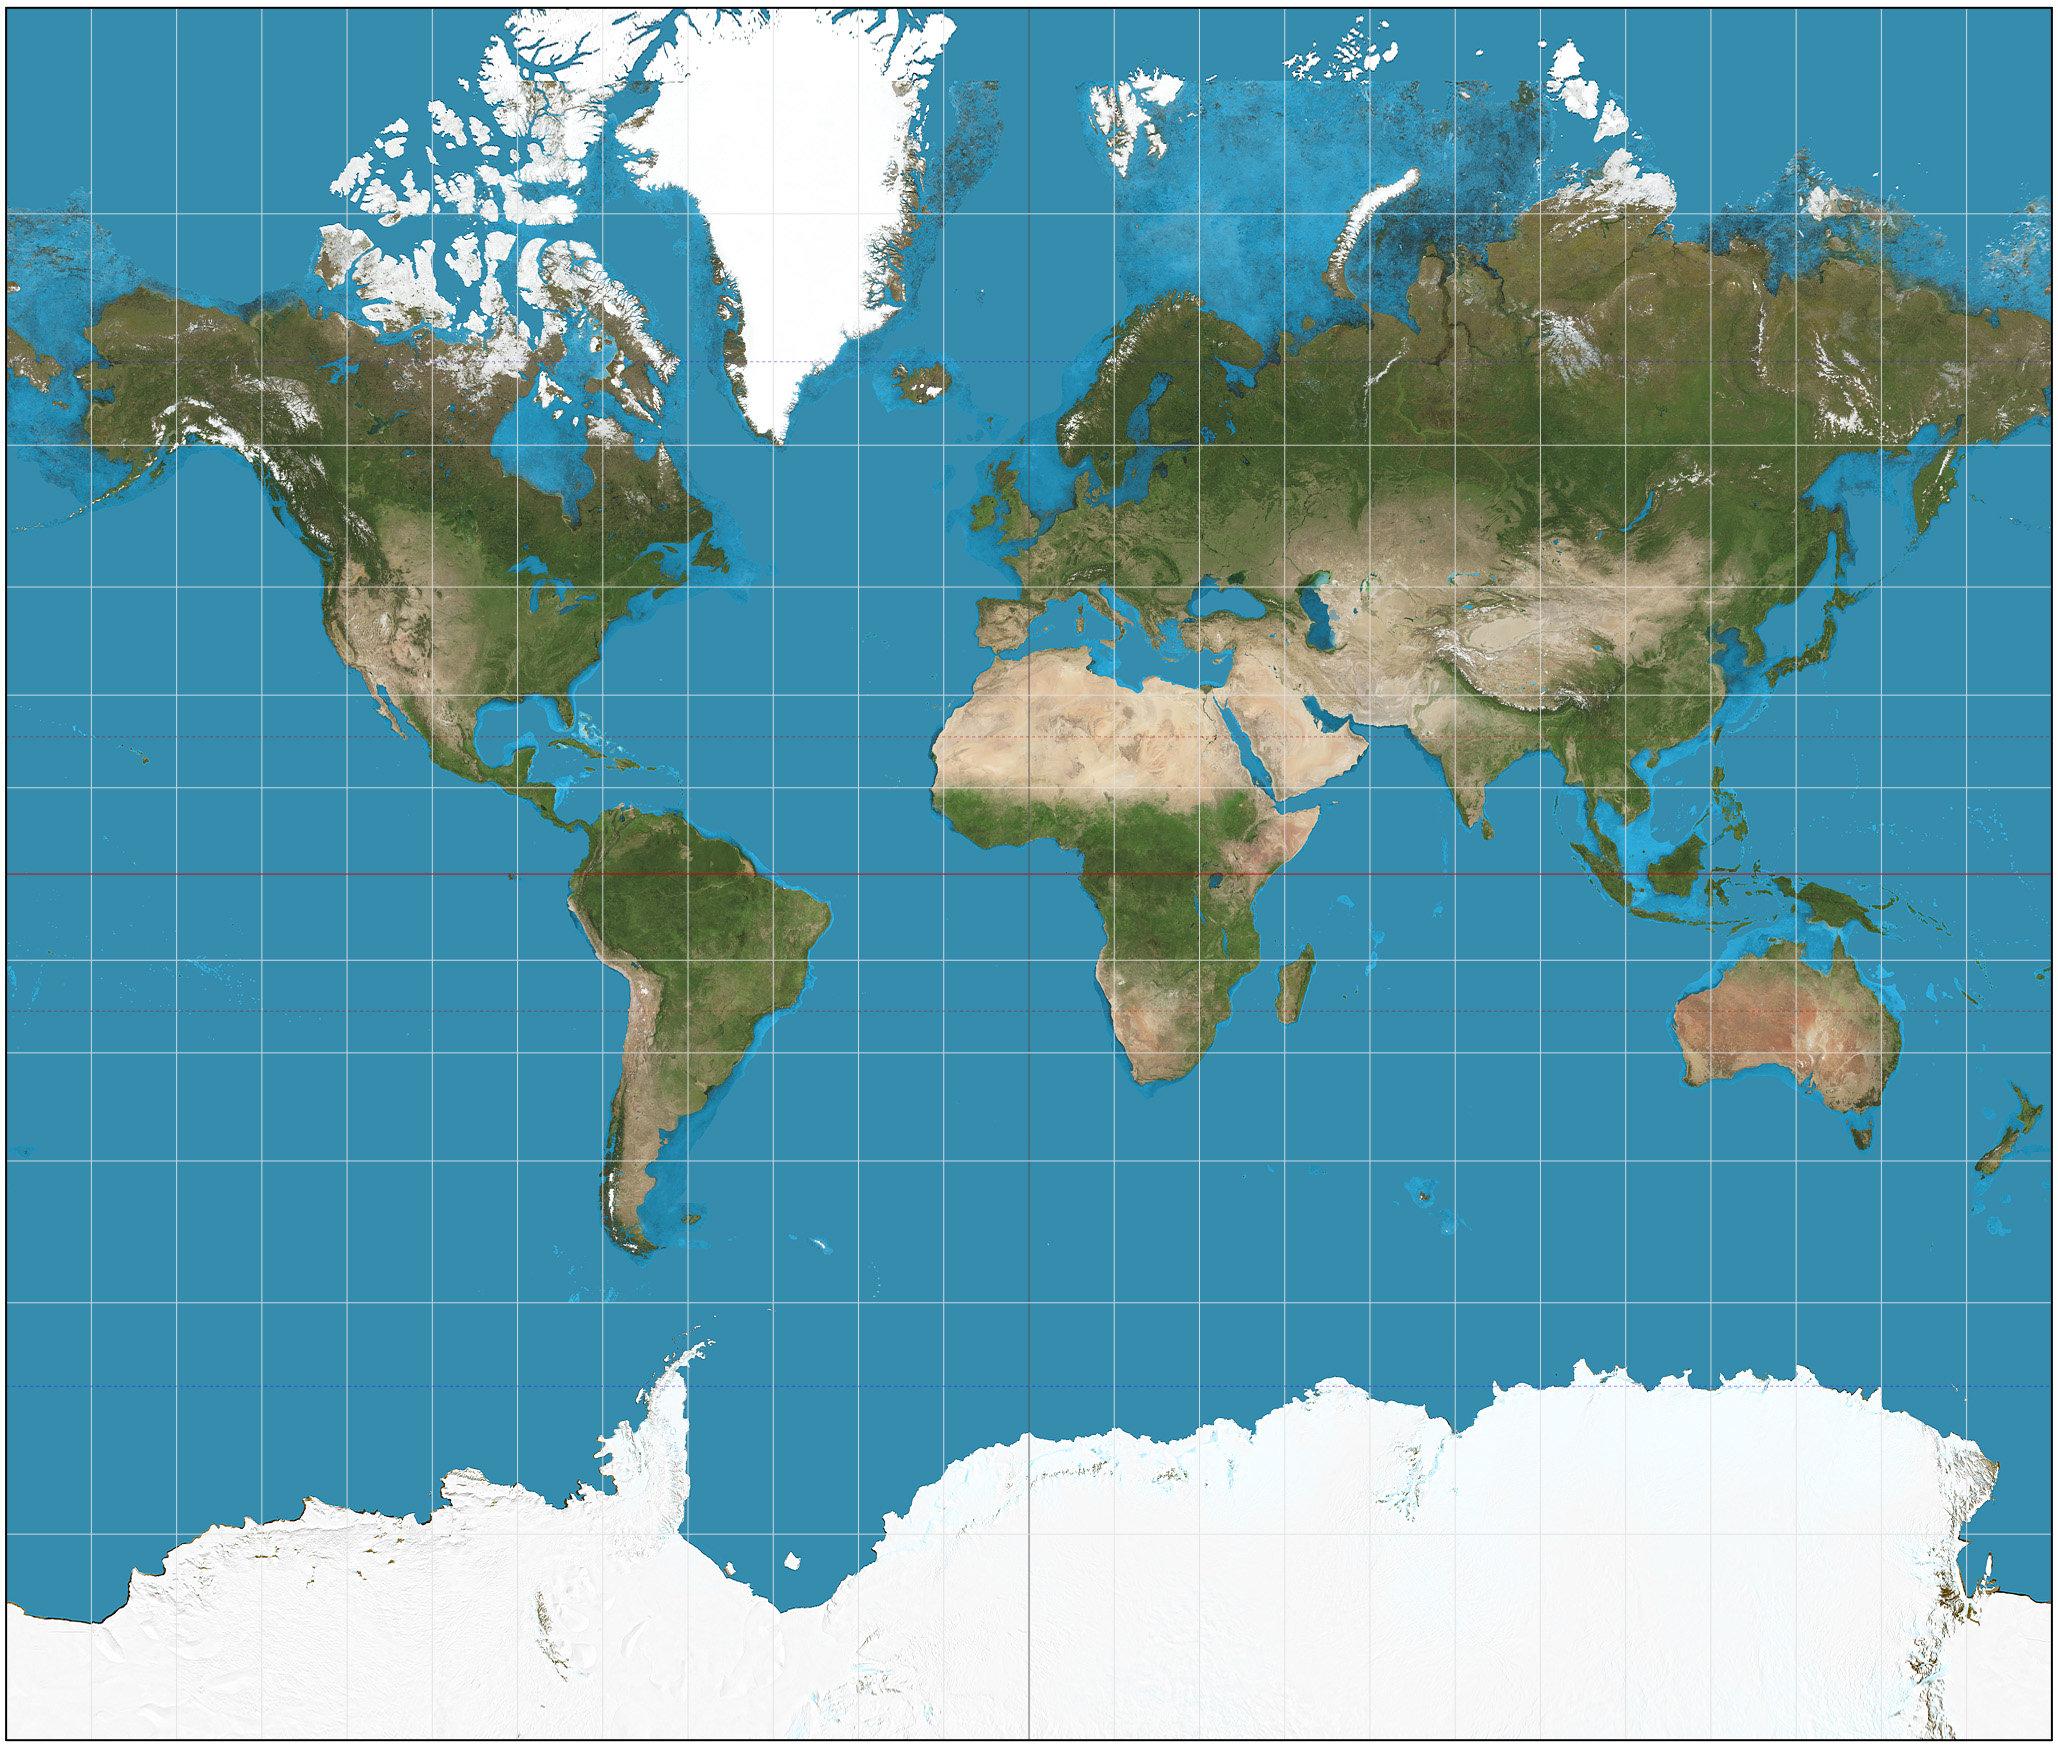 2013-08-03-Mercator_projection_SW.jpg